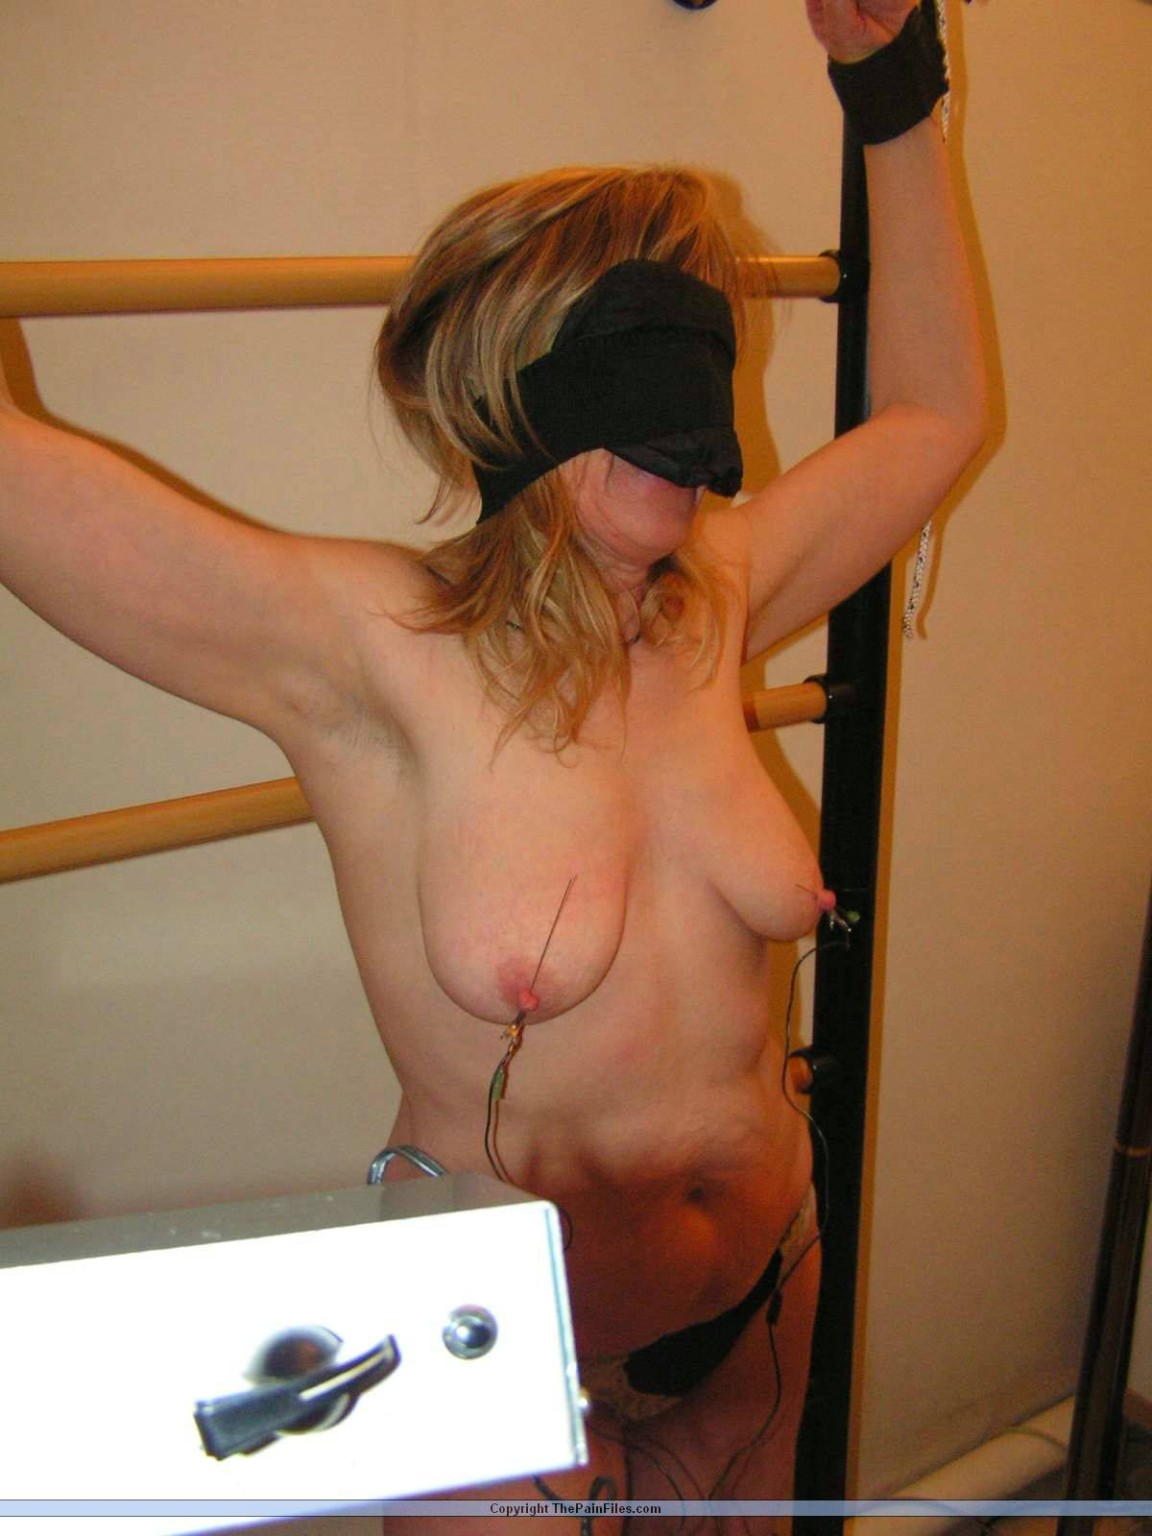 Amateur ass pics gf wife